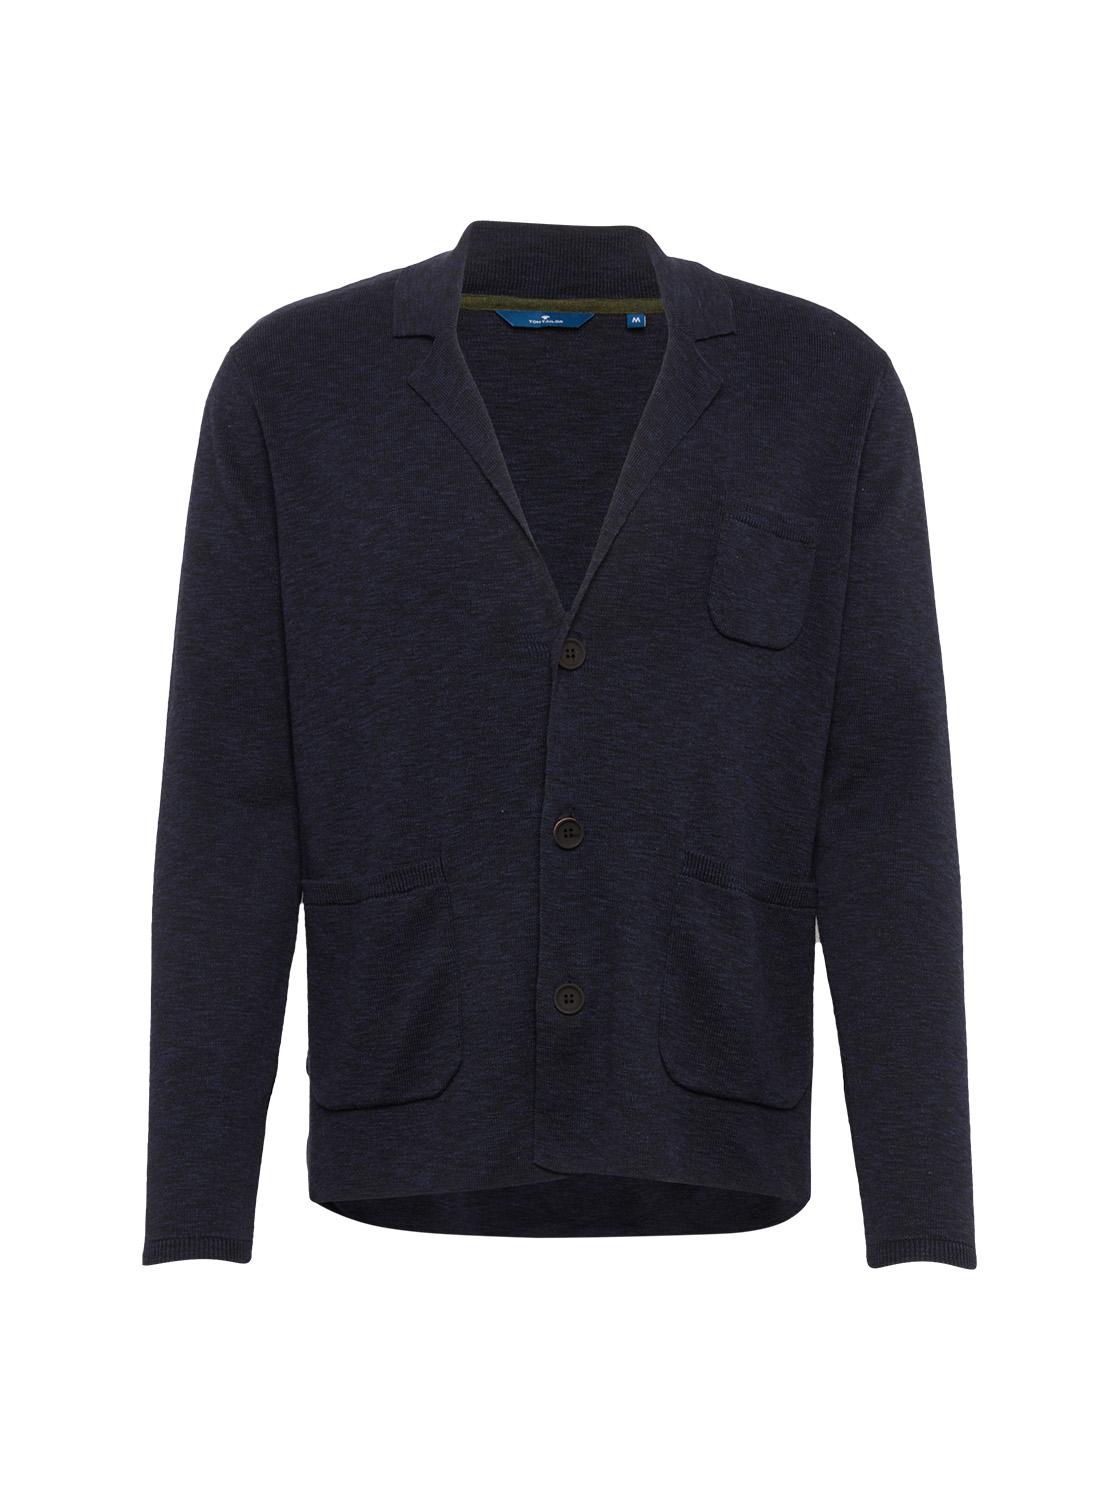 Blazer uni 1/1 lapel-collar, true dark blue